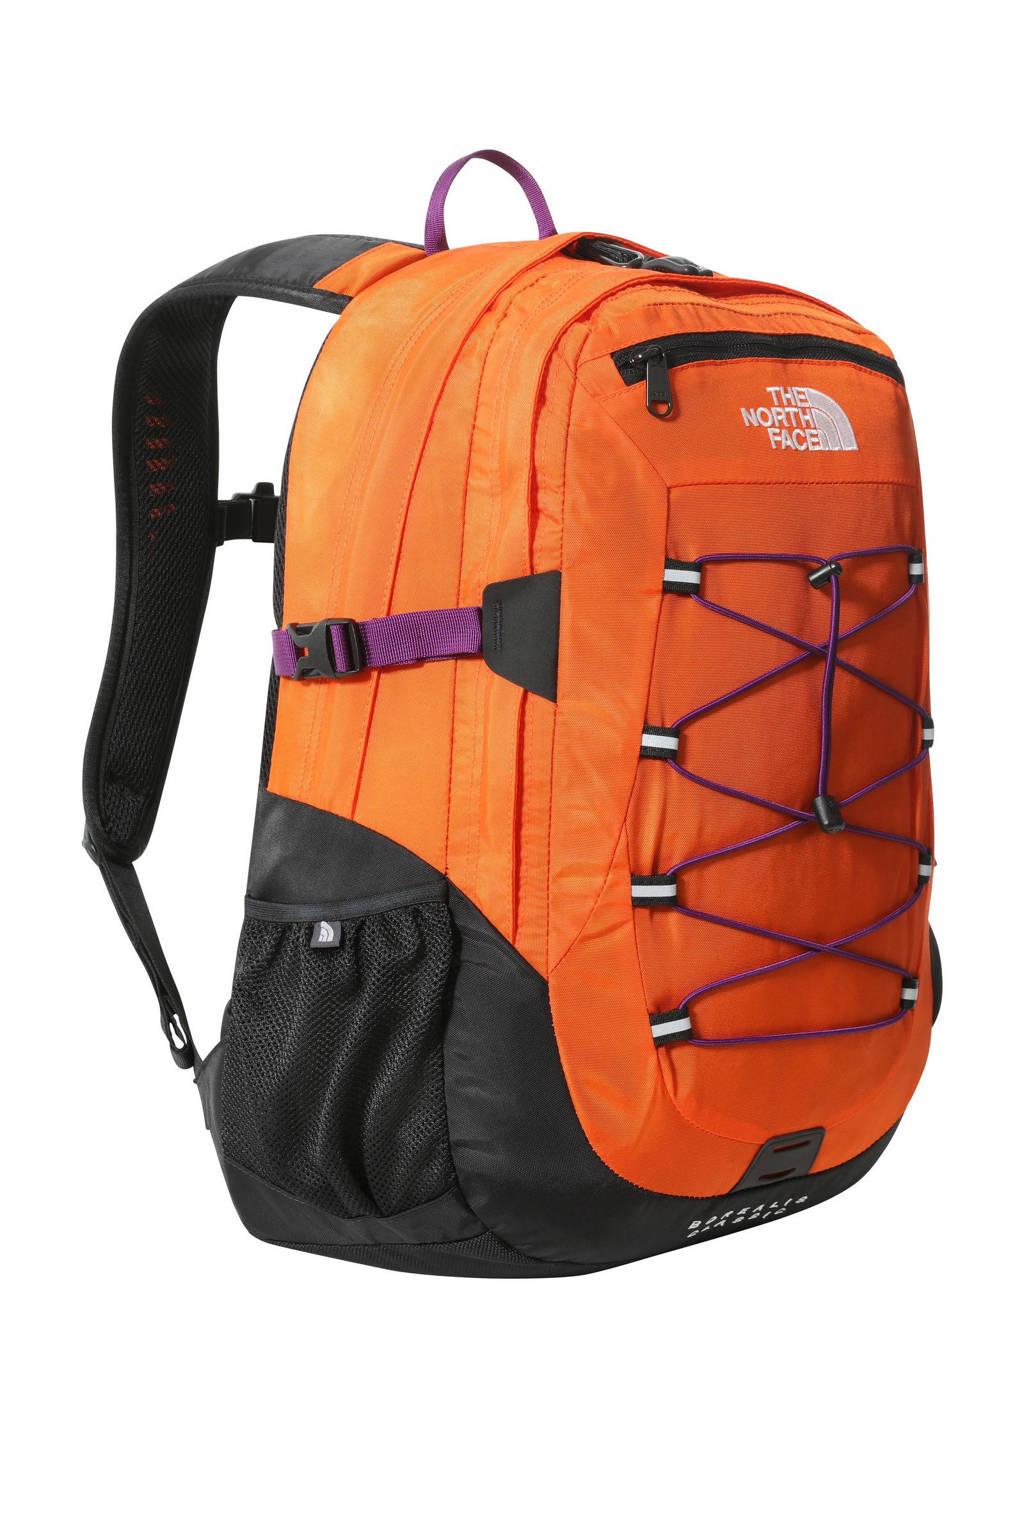 The North Face  rugzak Borealis Classic zwart/oranje, Zwart/oranje